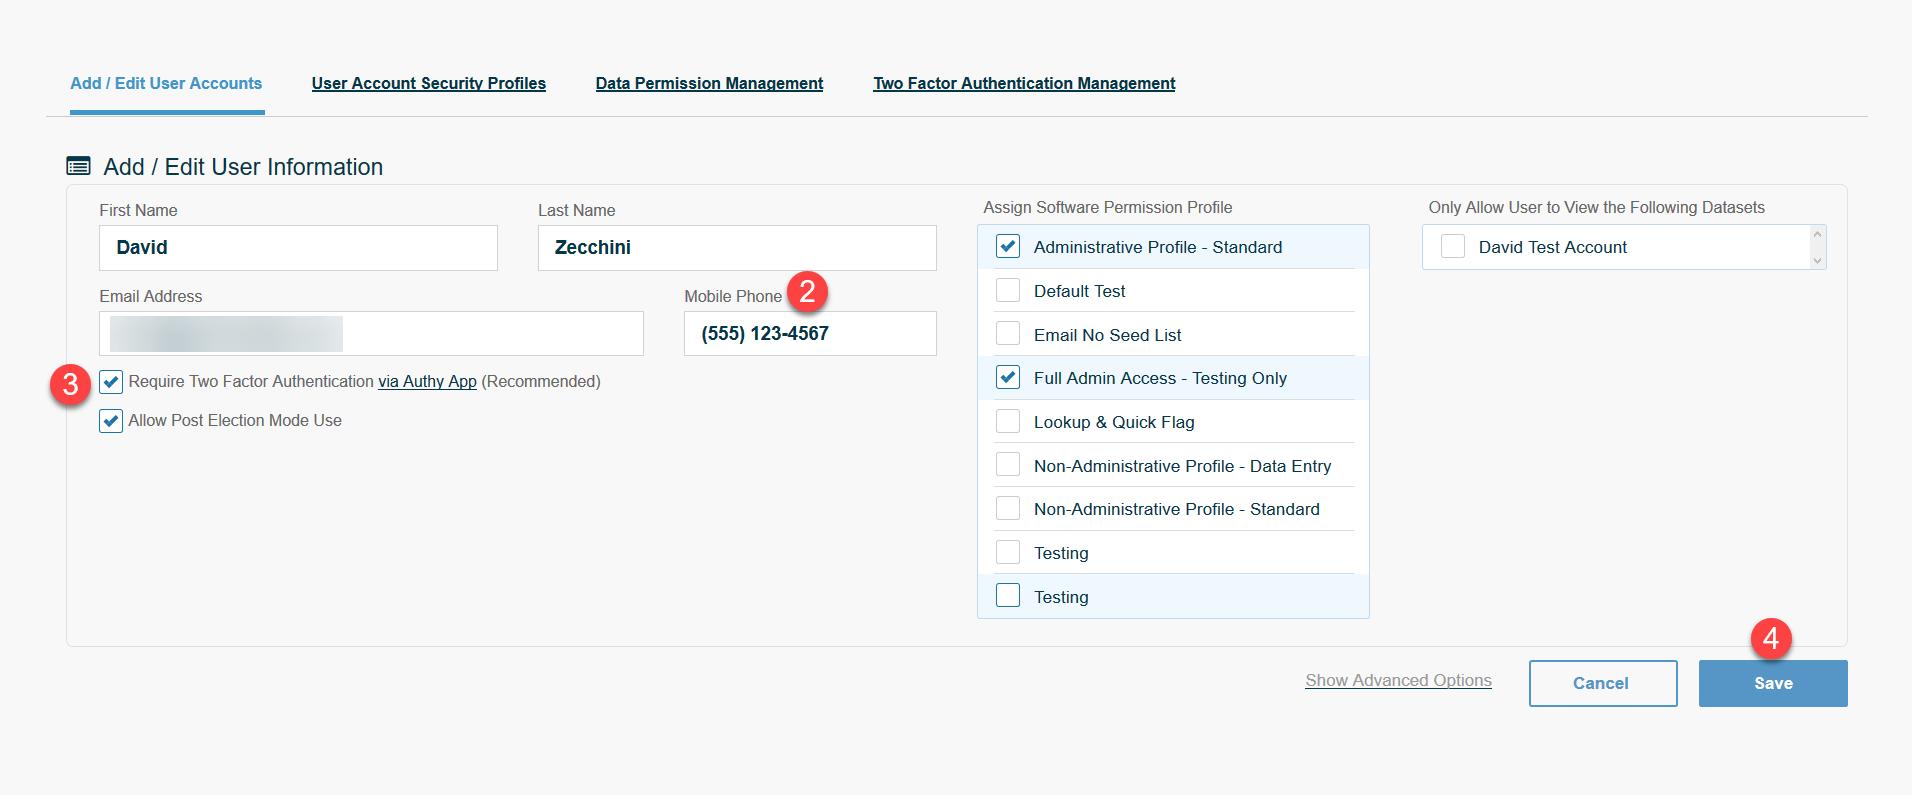 Add/Edit User Accounts